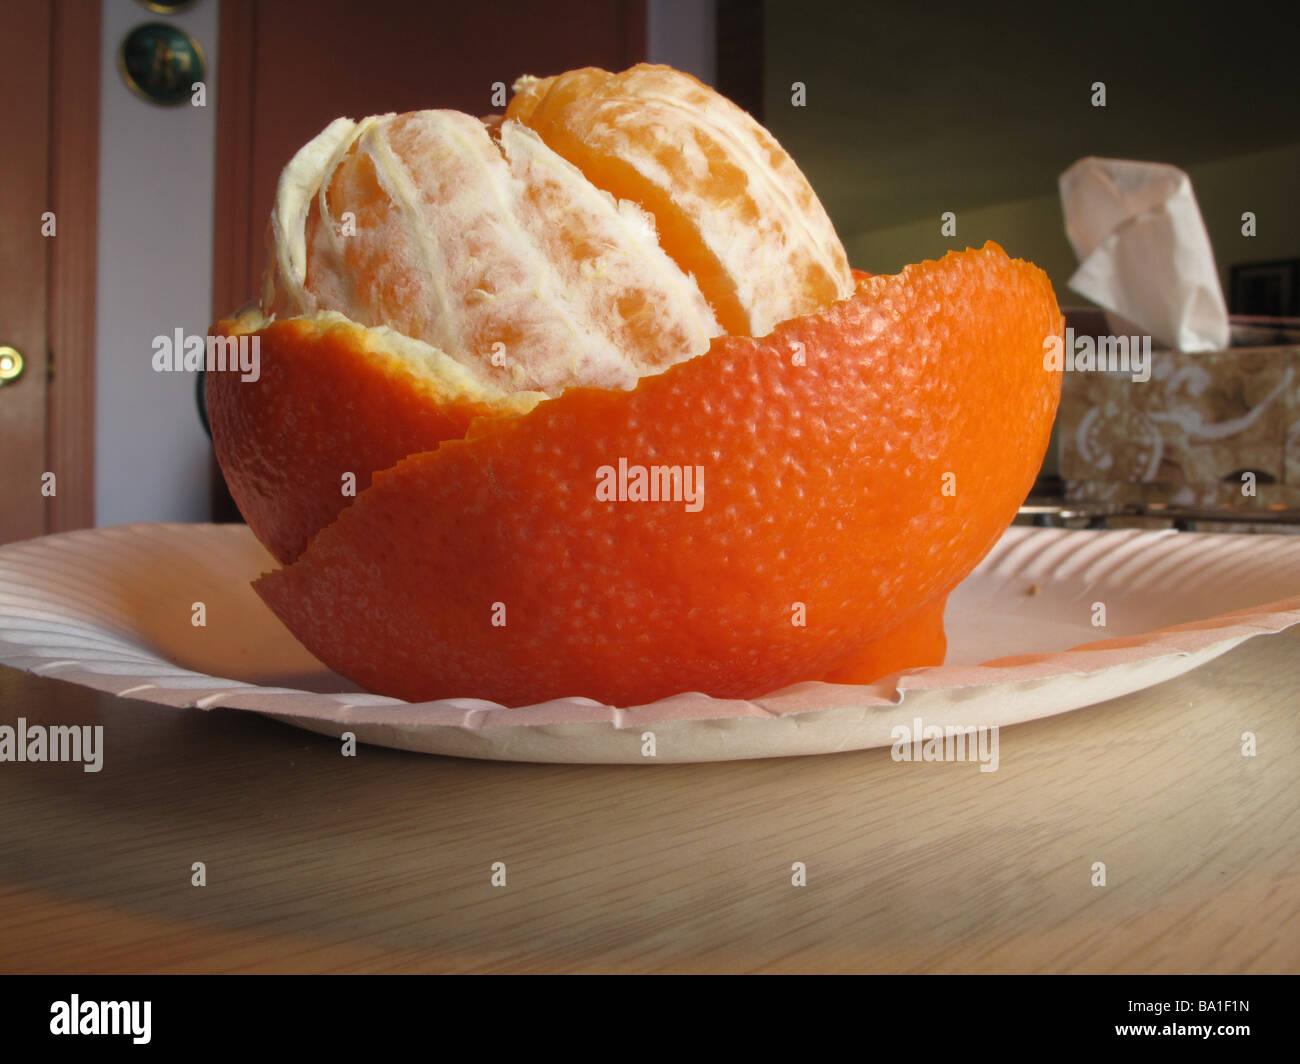 Mineola orange peeled on paper plate. - Stock Image